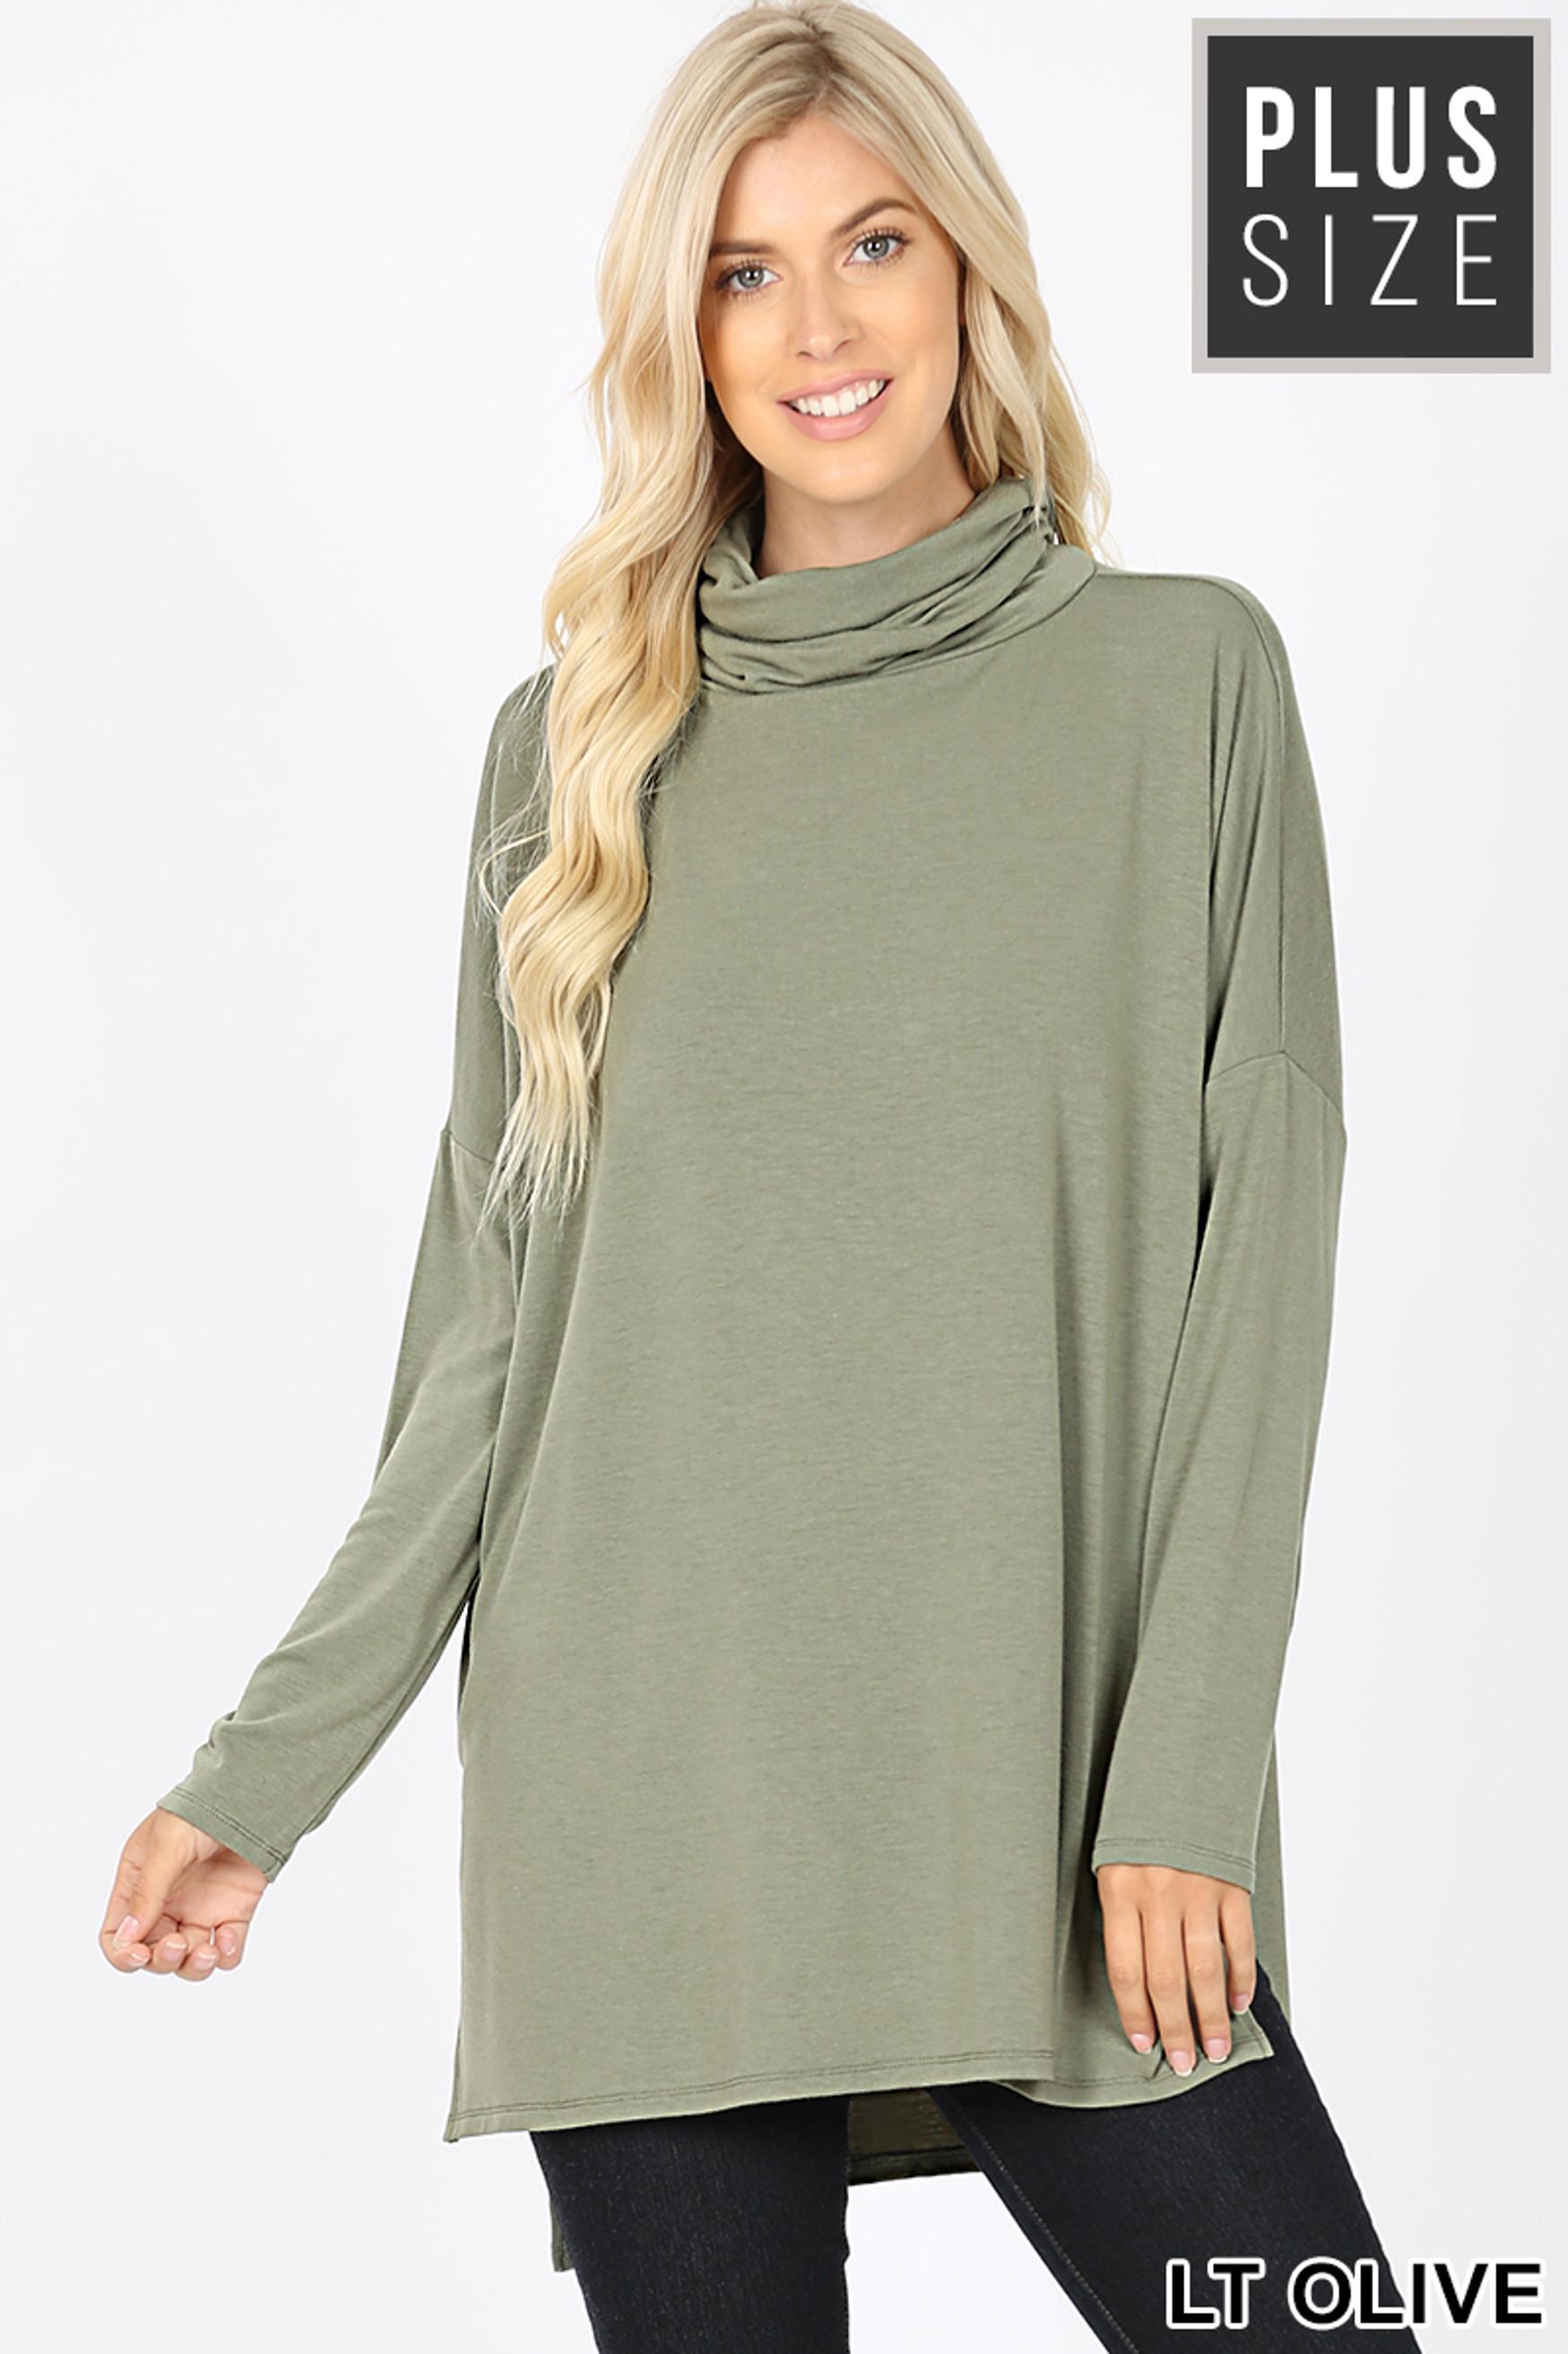 Front image Light Olive Mocha Rayon Cowl Neck Dolman Sleeve Plus Size Top